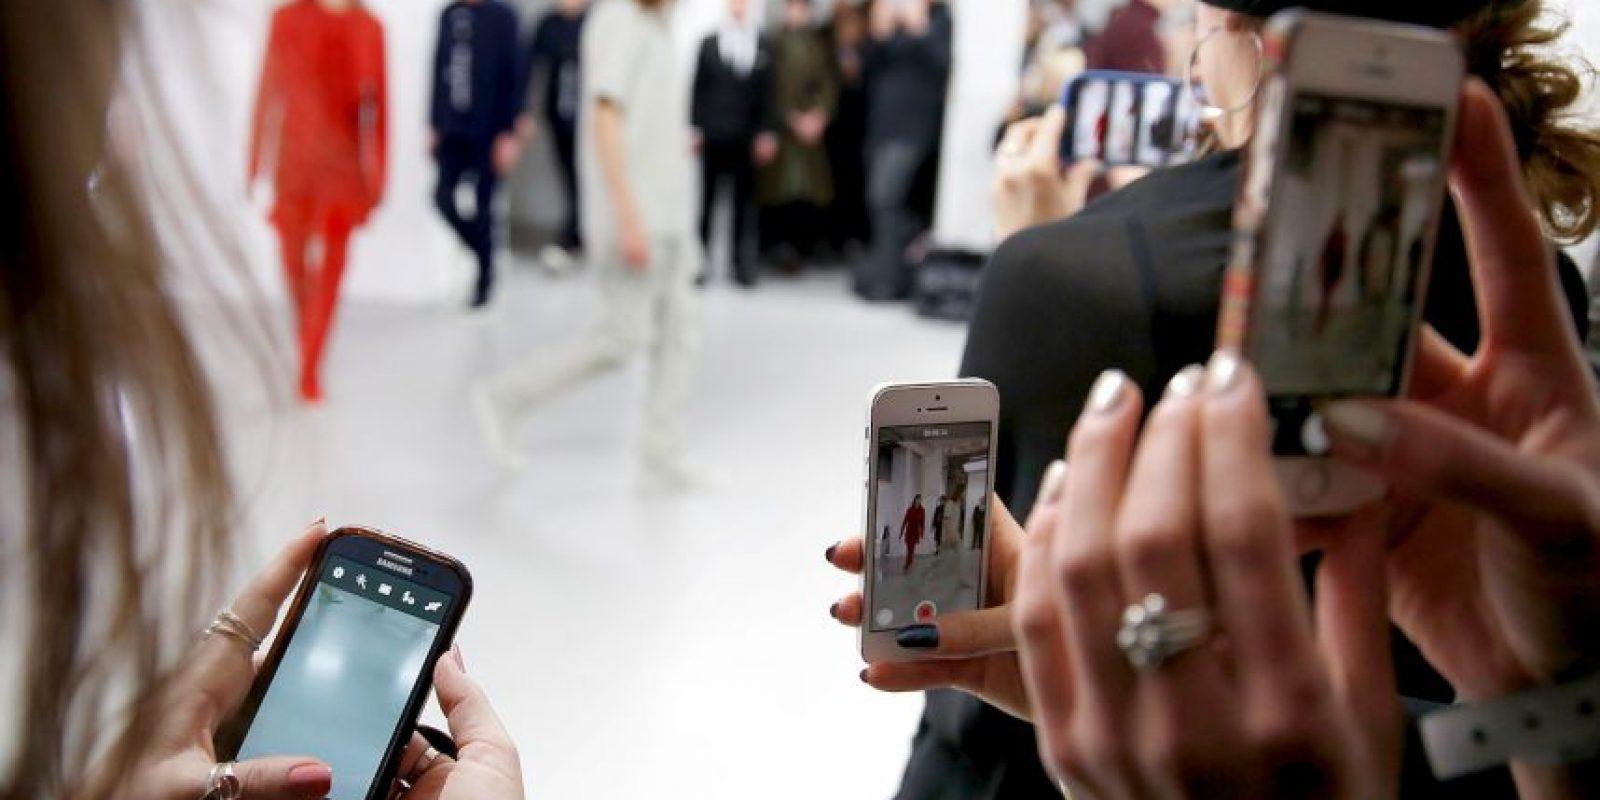 9. Personalice su smartphone Foto:Getty Images